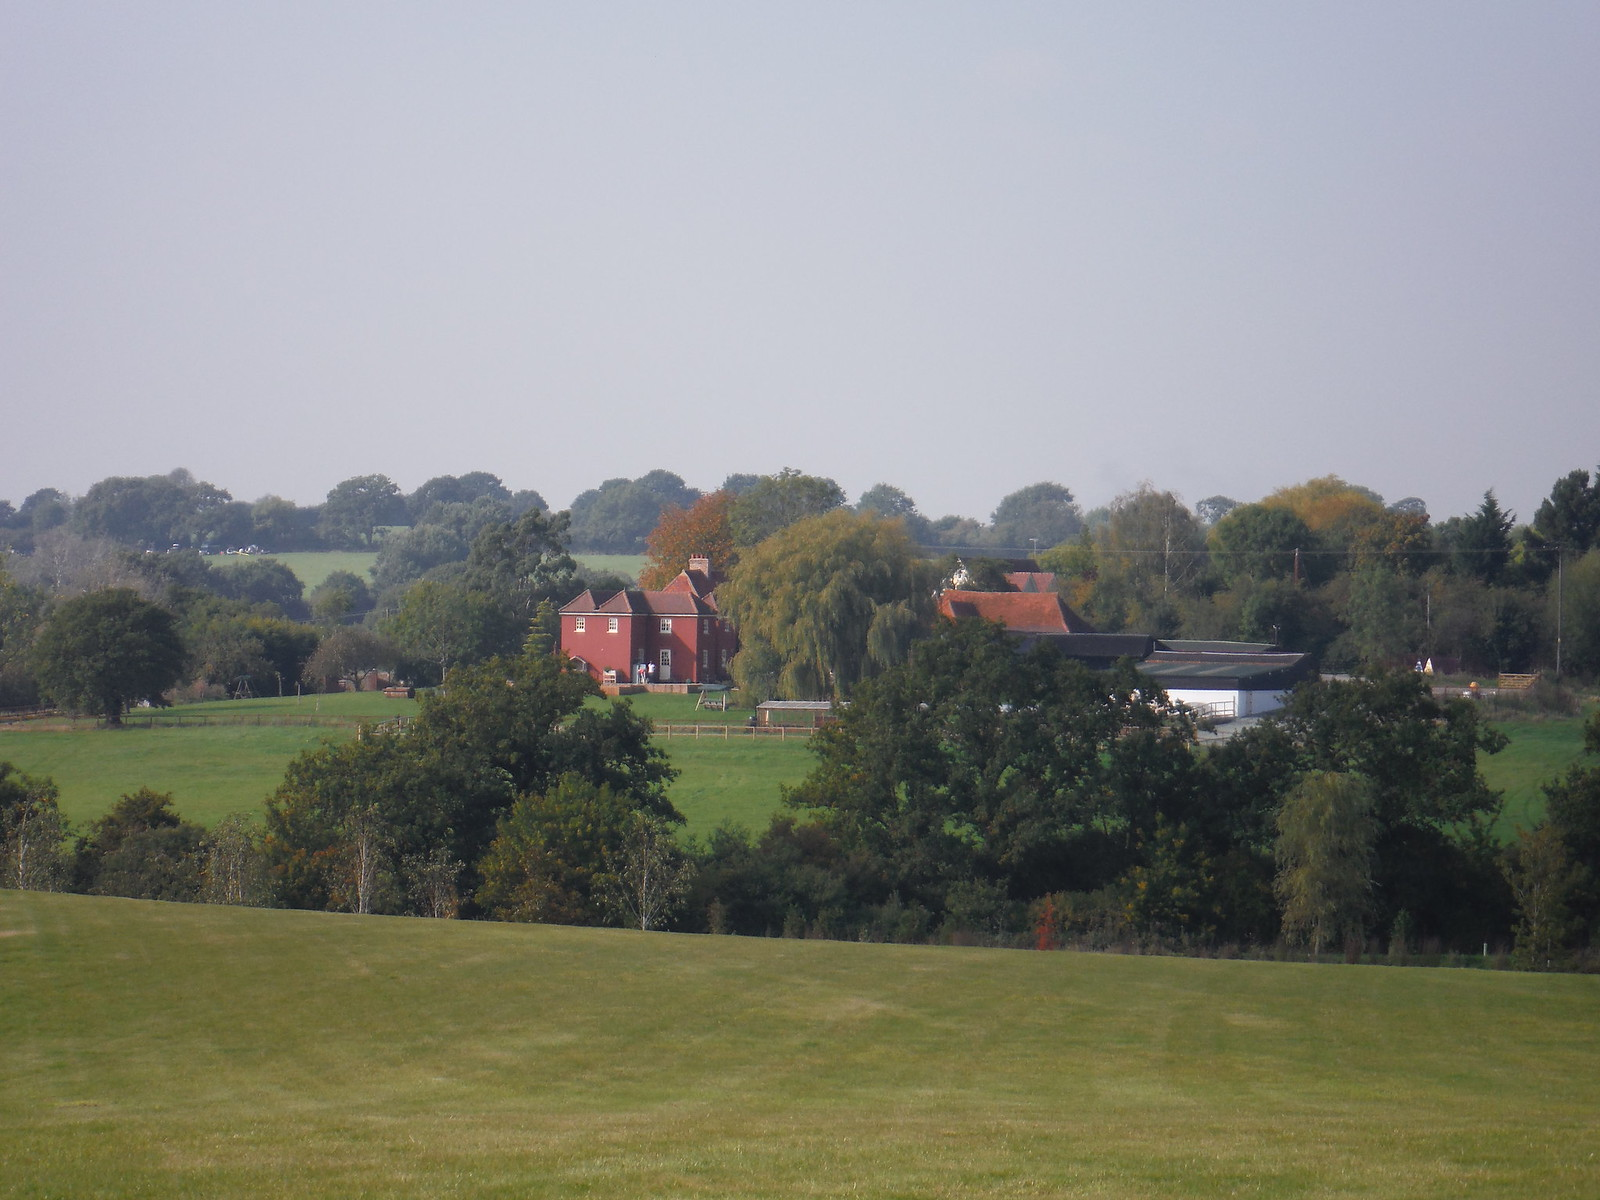 Whites Farm, Buckhatch Lane SWC Walk 159 South Woodham Ferrers to North Fambridge